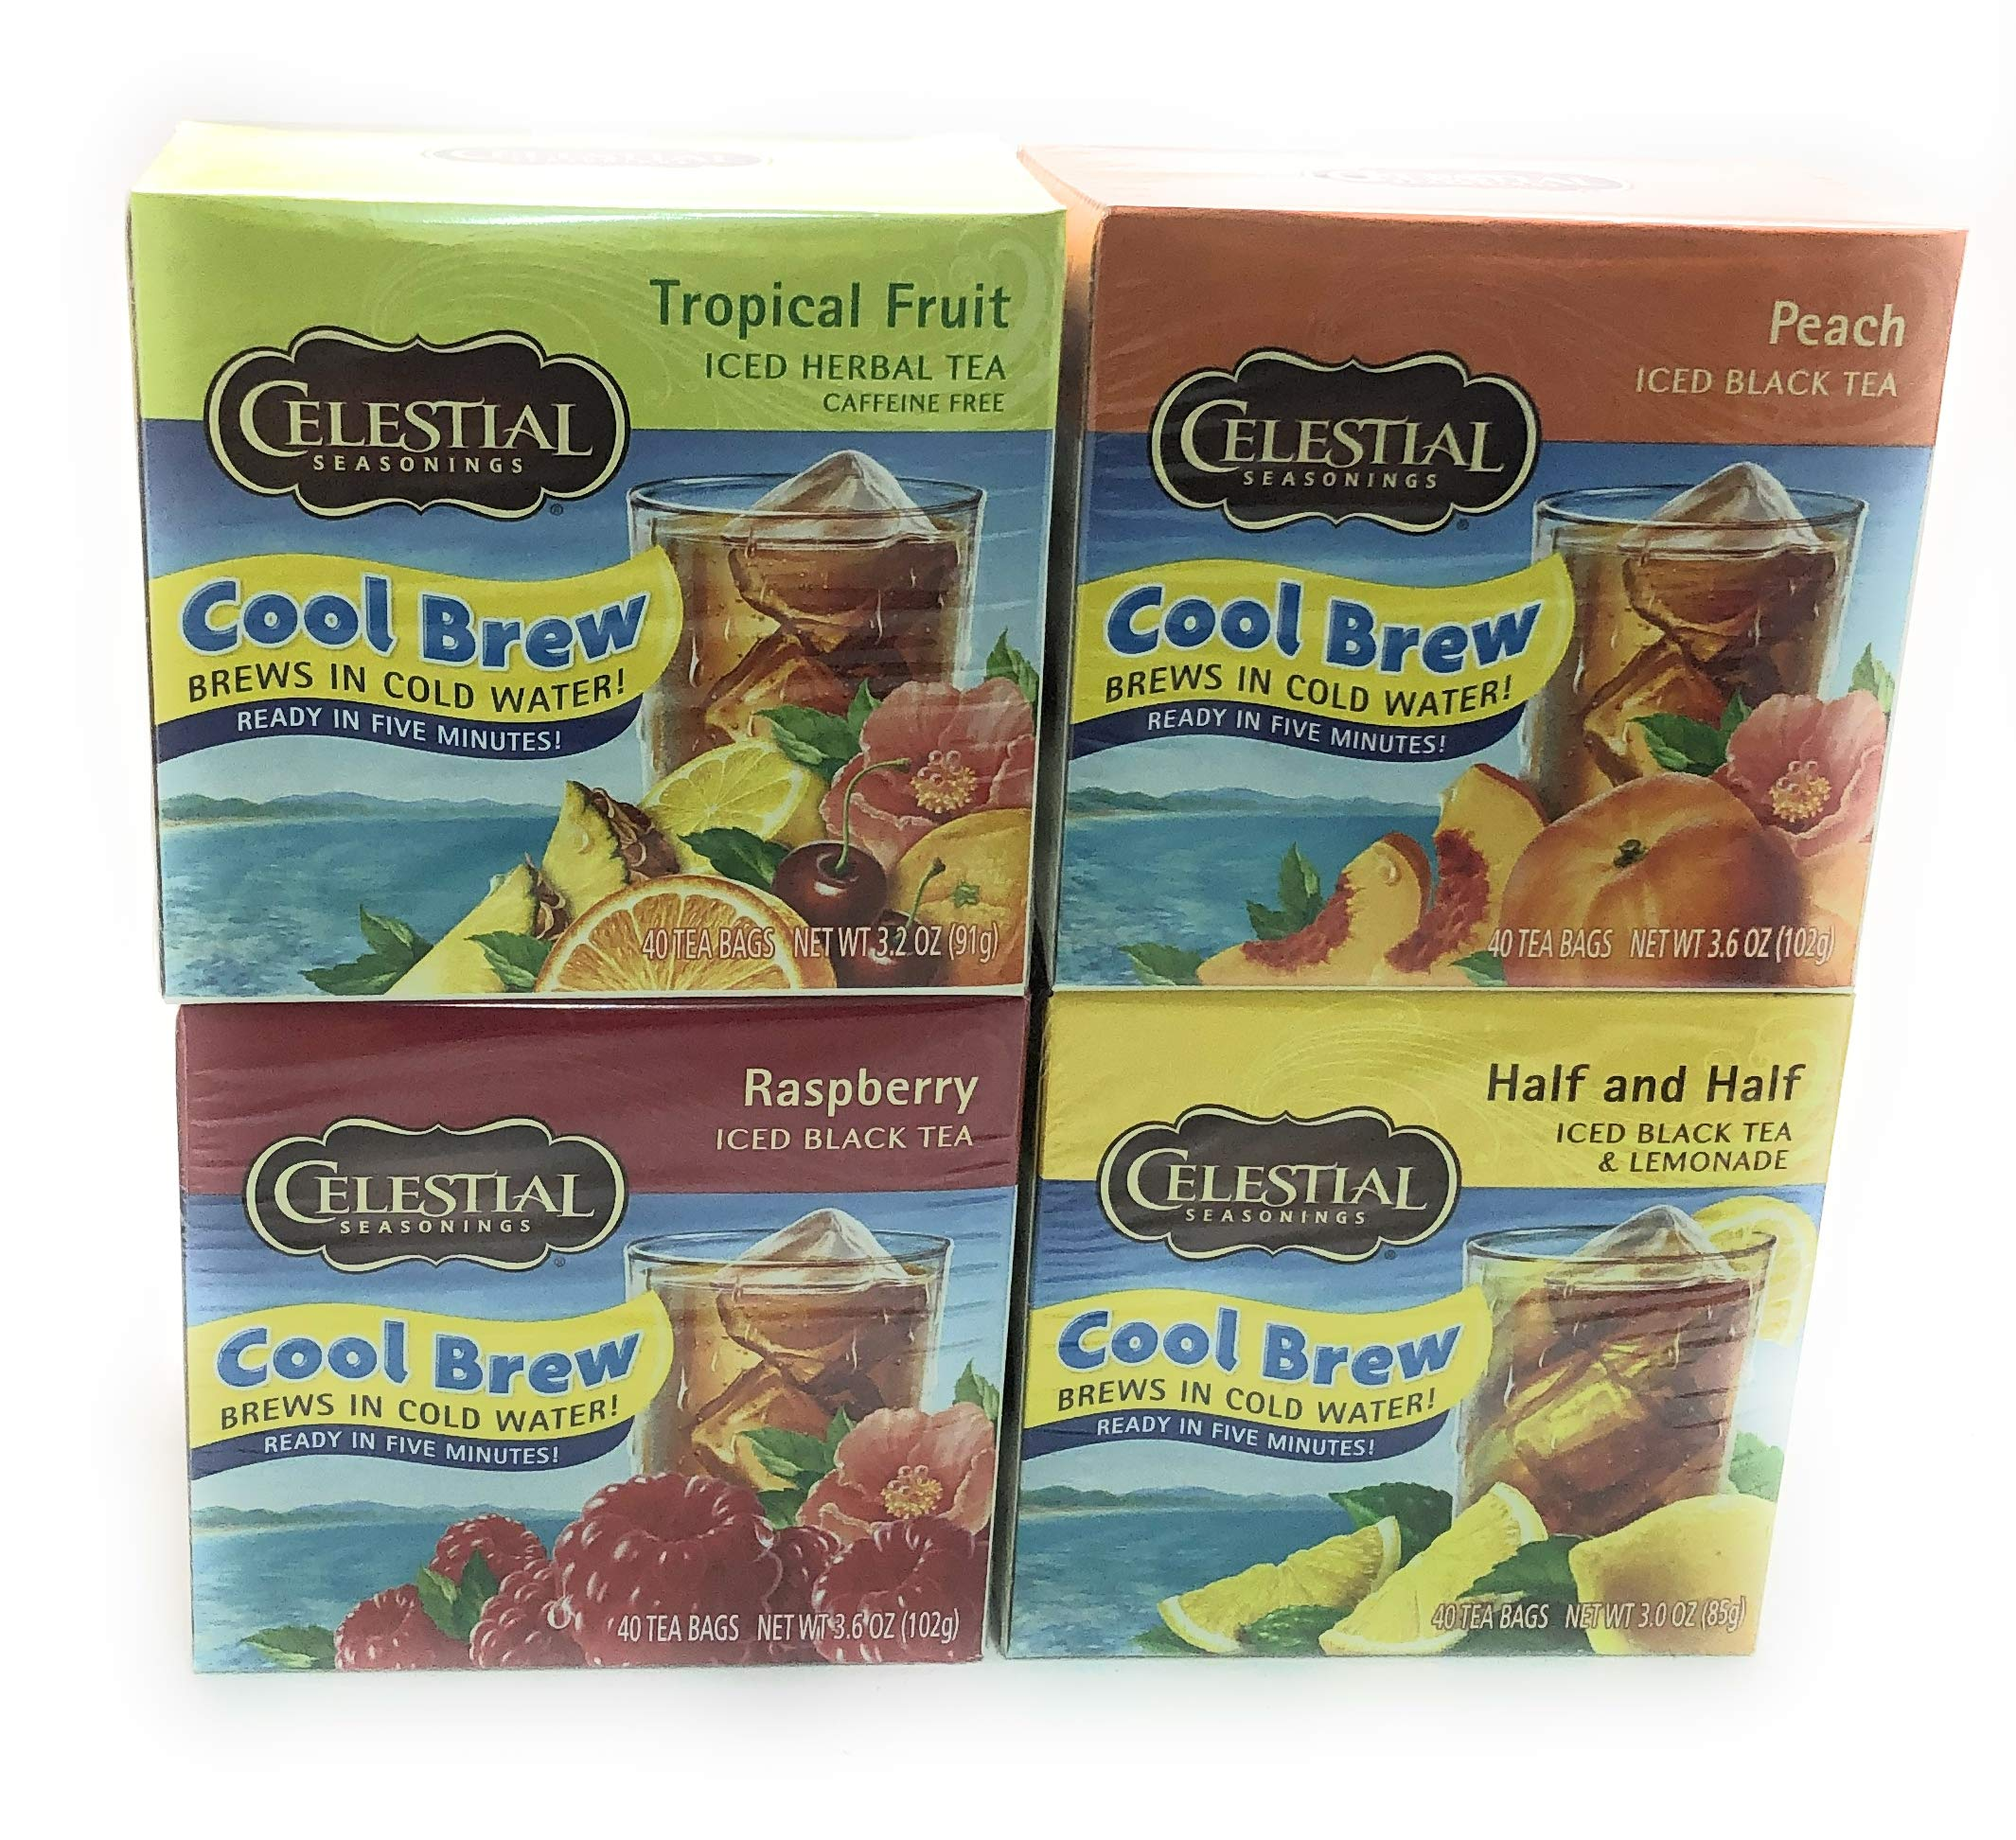 Celestial Cool Brew Variety Pack of Tropical Fruit, Raspberry, Peach, and Half Black Iced Tea & Half Lemonade